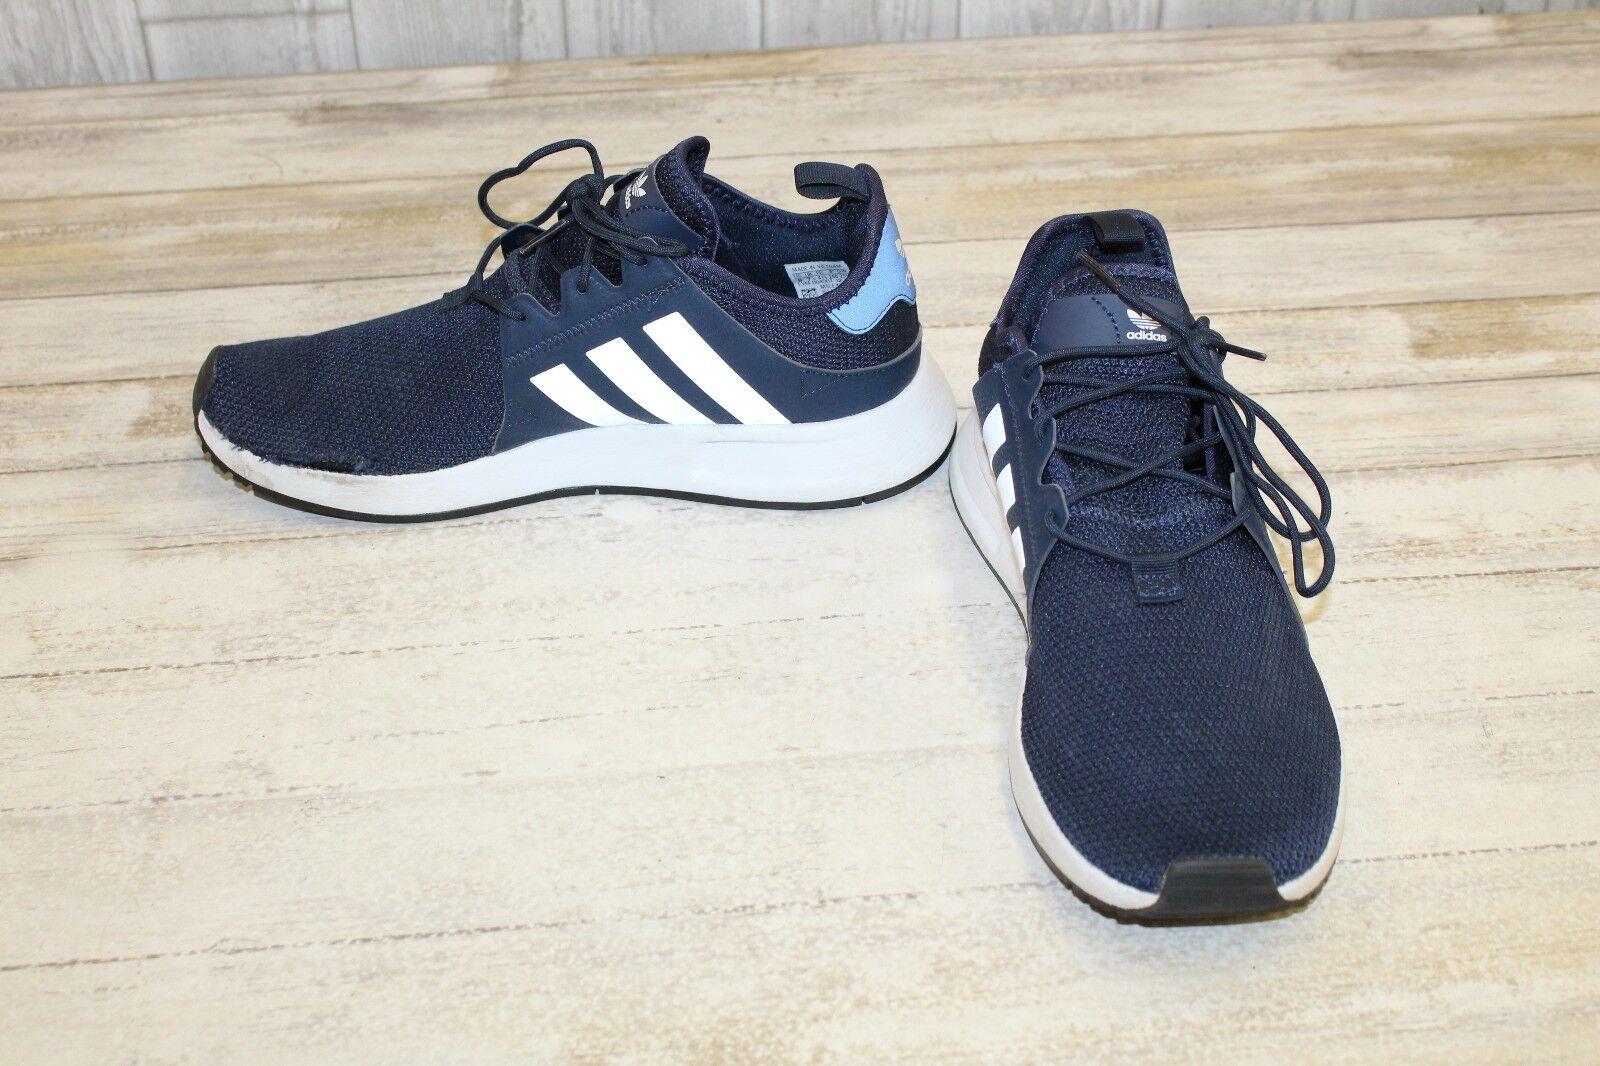 Adidas Originals X PLR Sneaker - Men's Comfortable Comfortable and good-looking